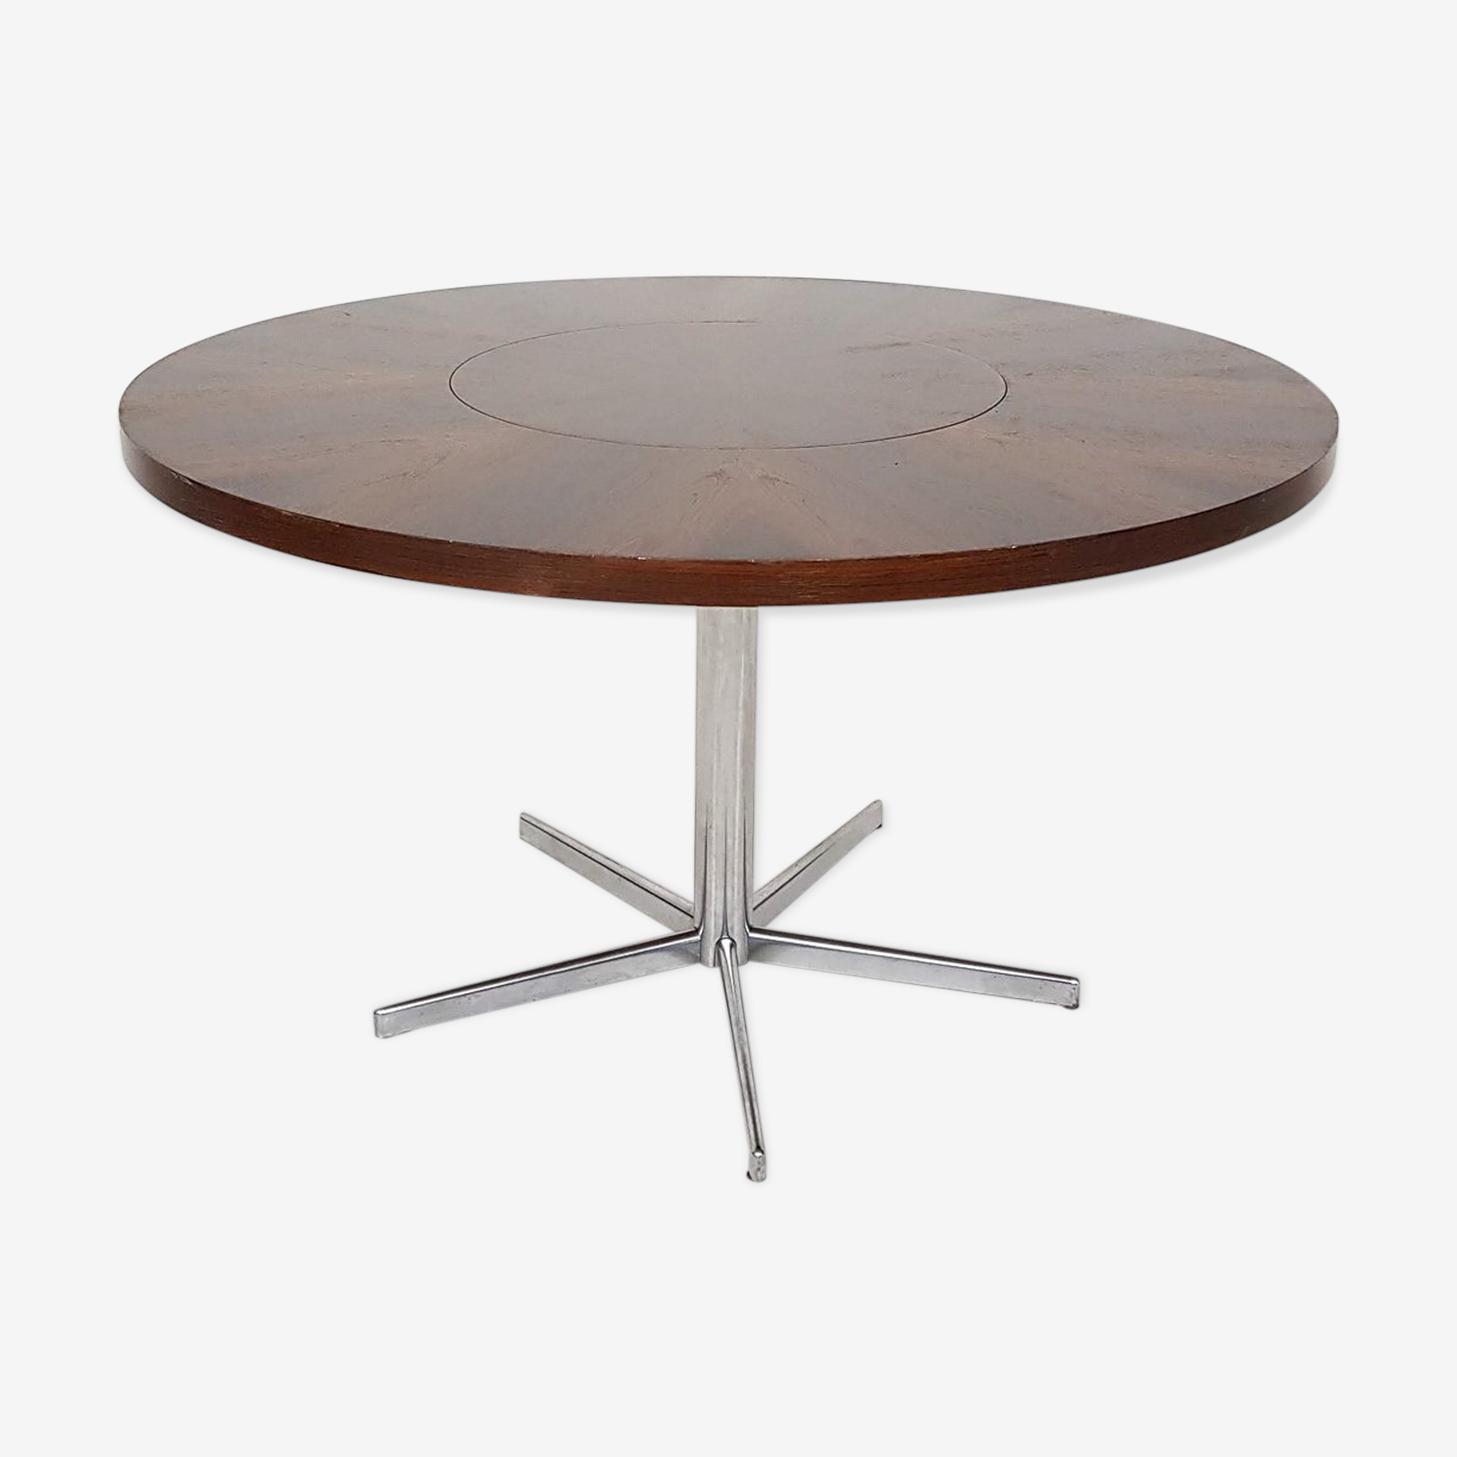 Table à manger ronde palissandre par EMÜ Allemagne 1960 's